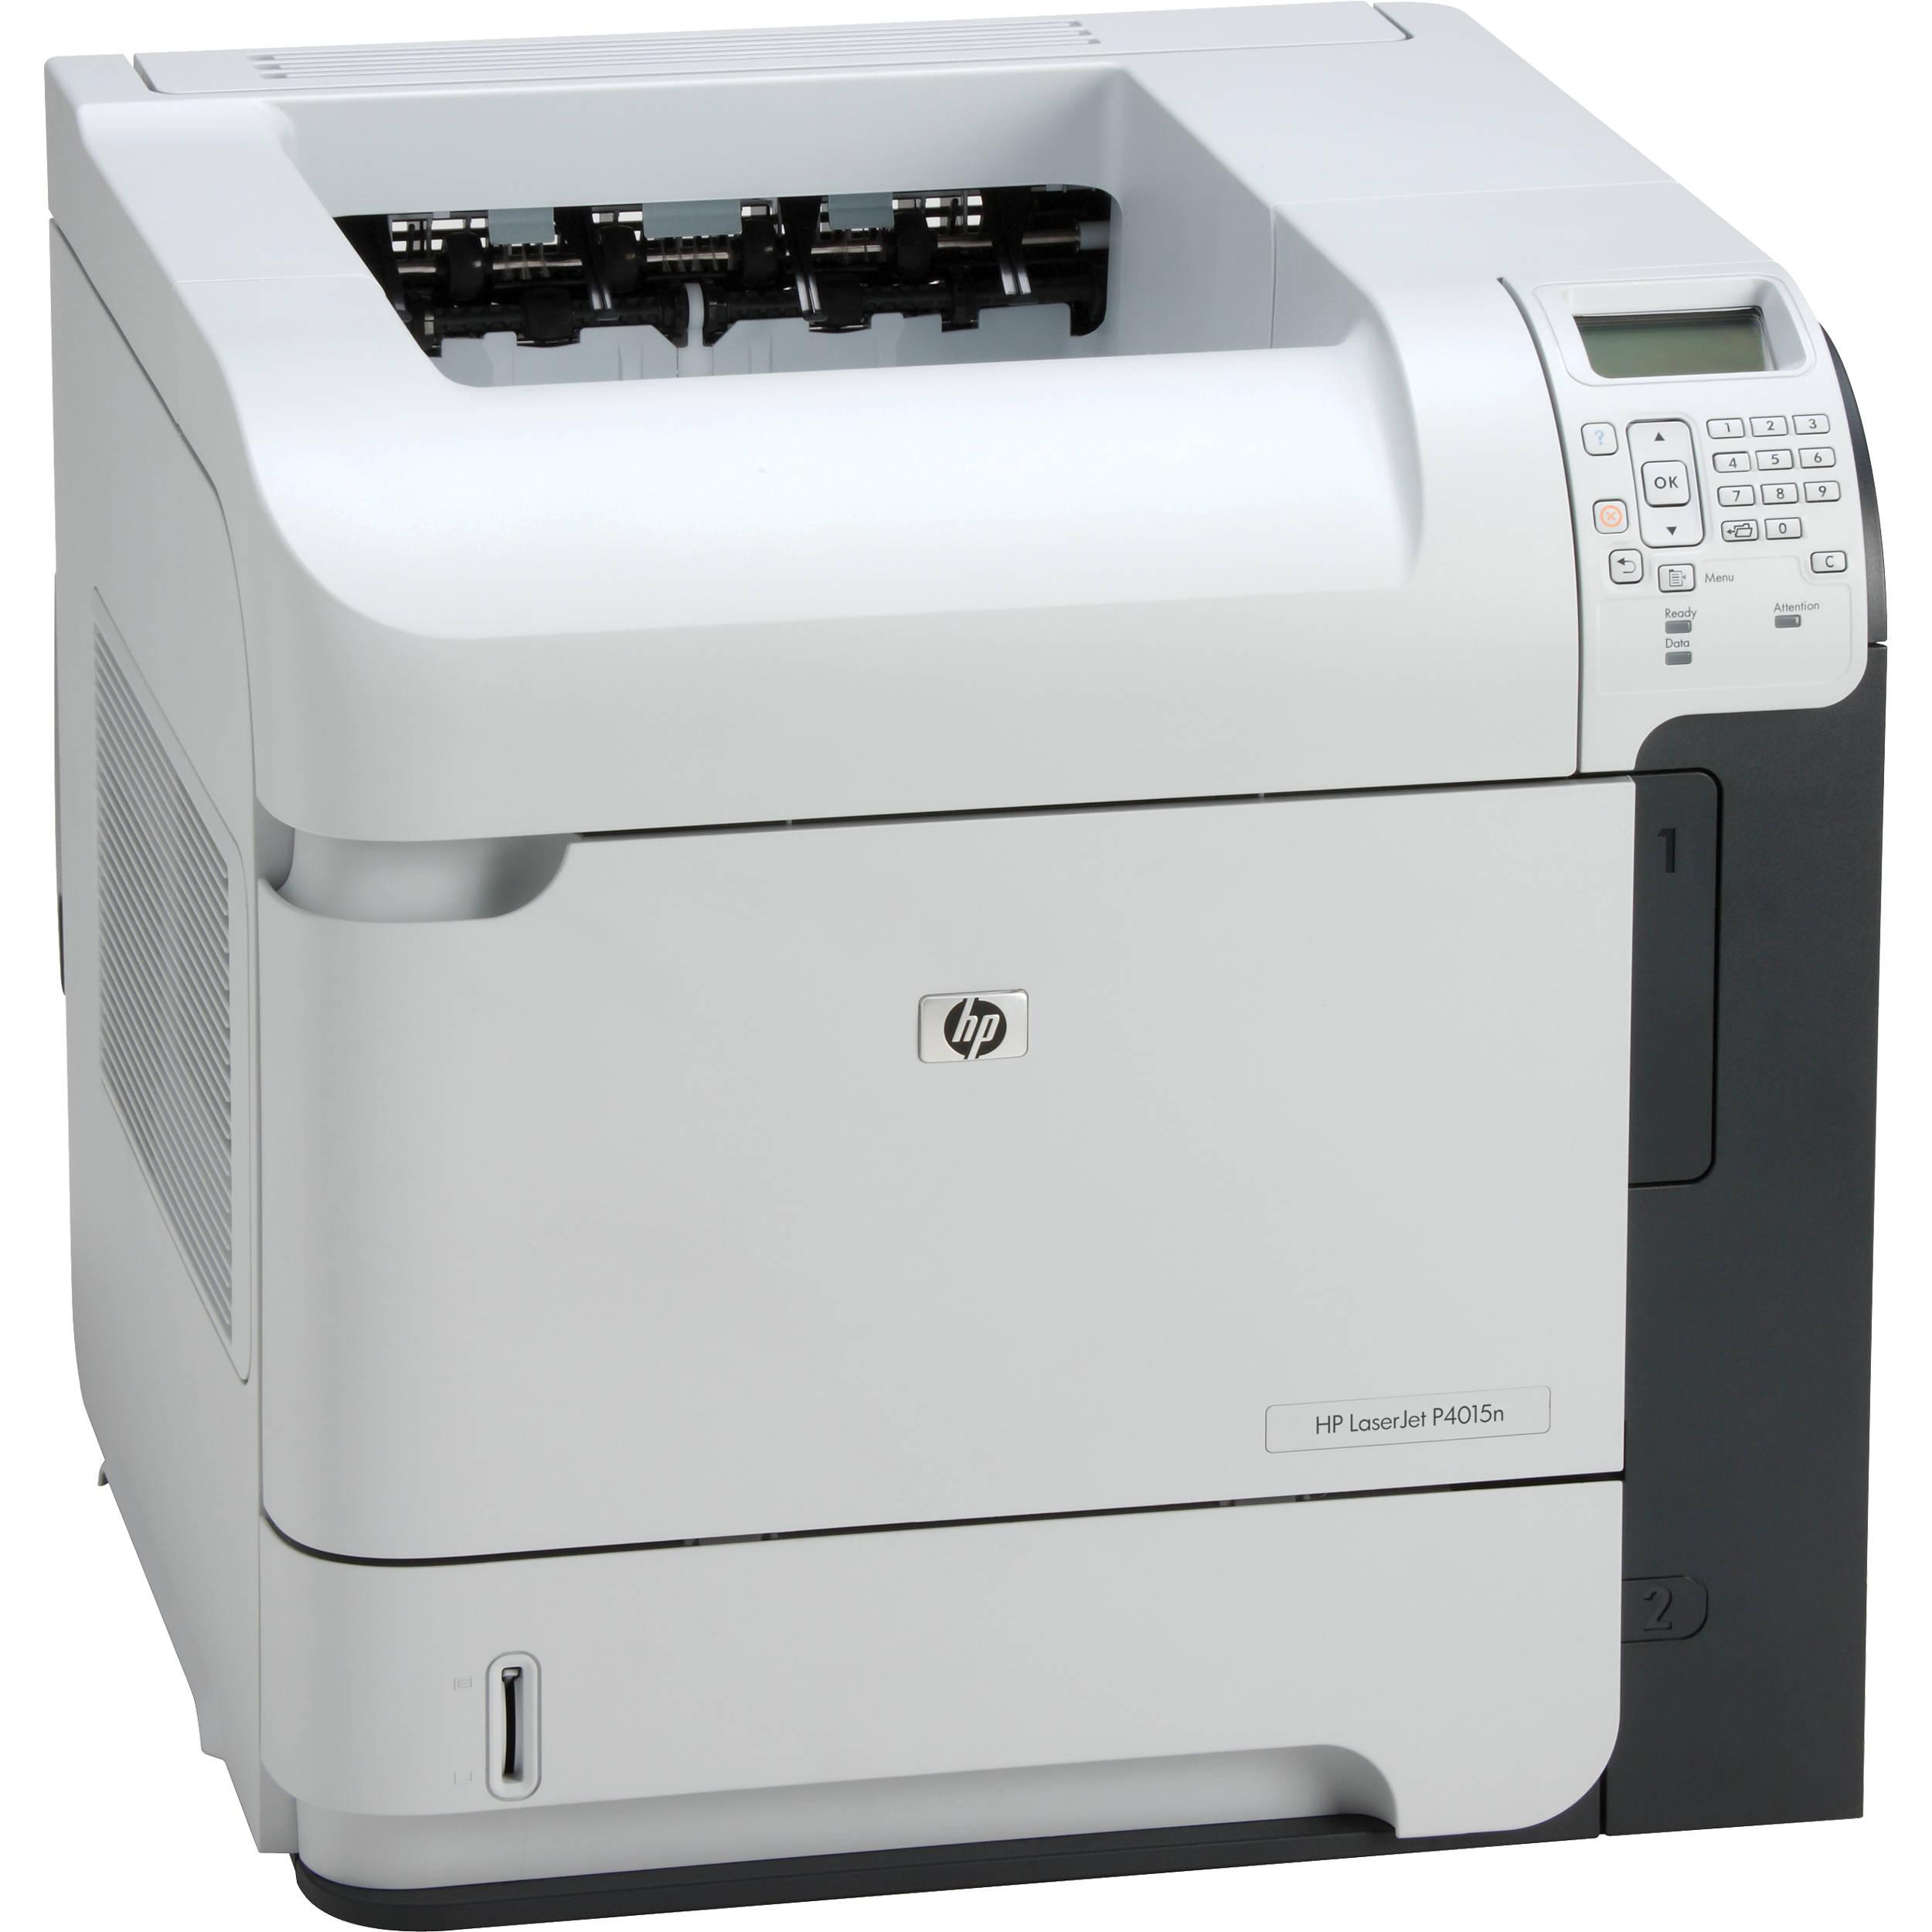 HP 4015N PRINTER WINDOWS DRIVER DOWNLOAD